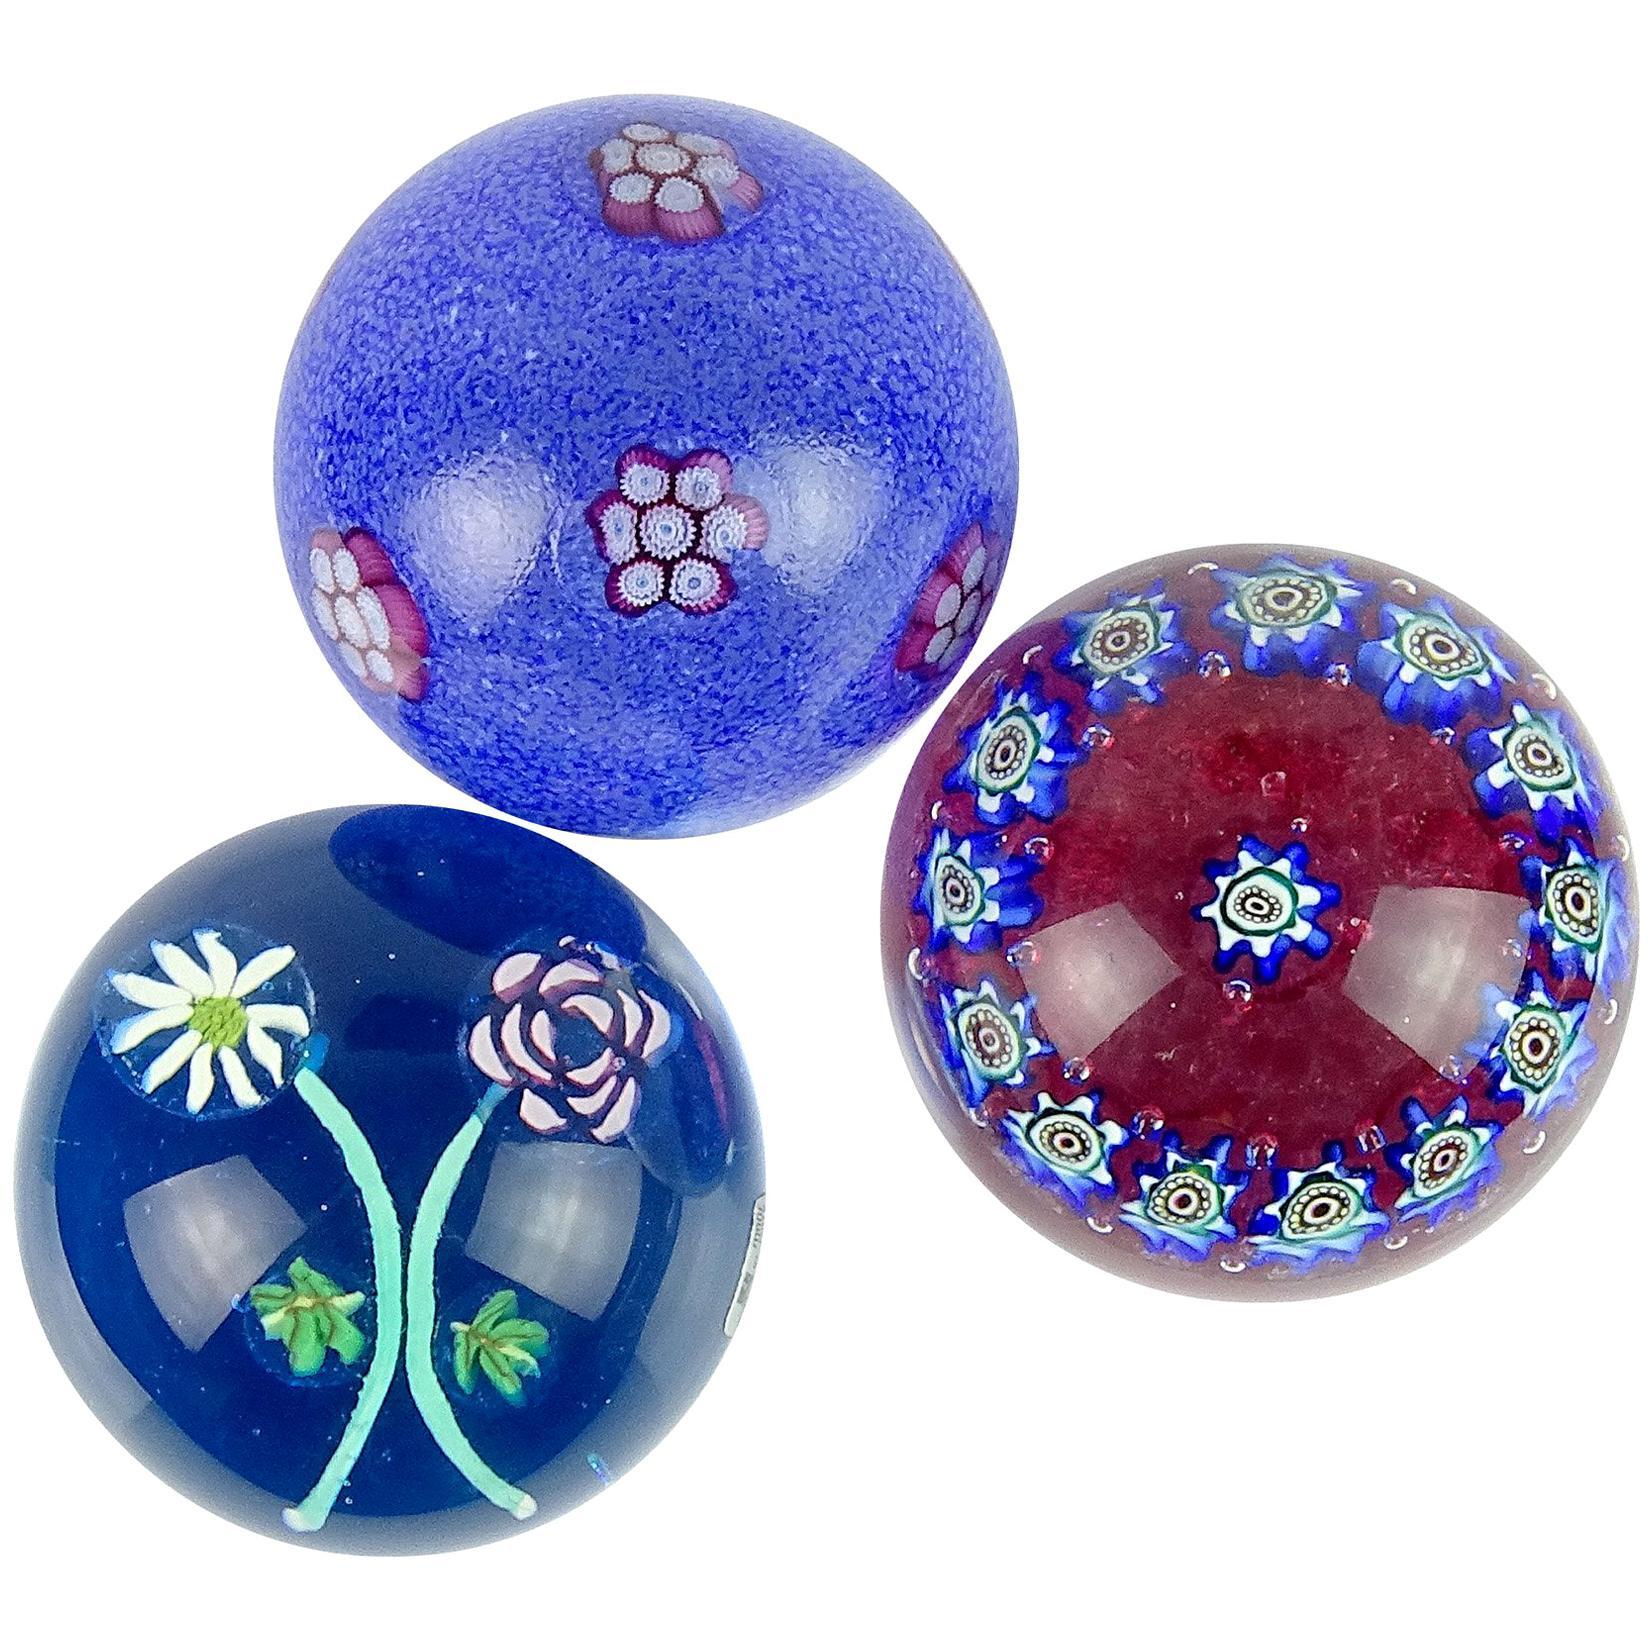 Fratelli Toso Murano Blue Millefiori Flower Italian Art Glass Paperweights